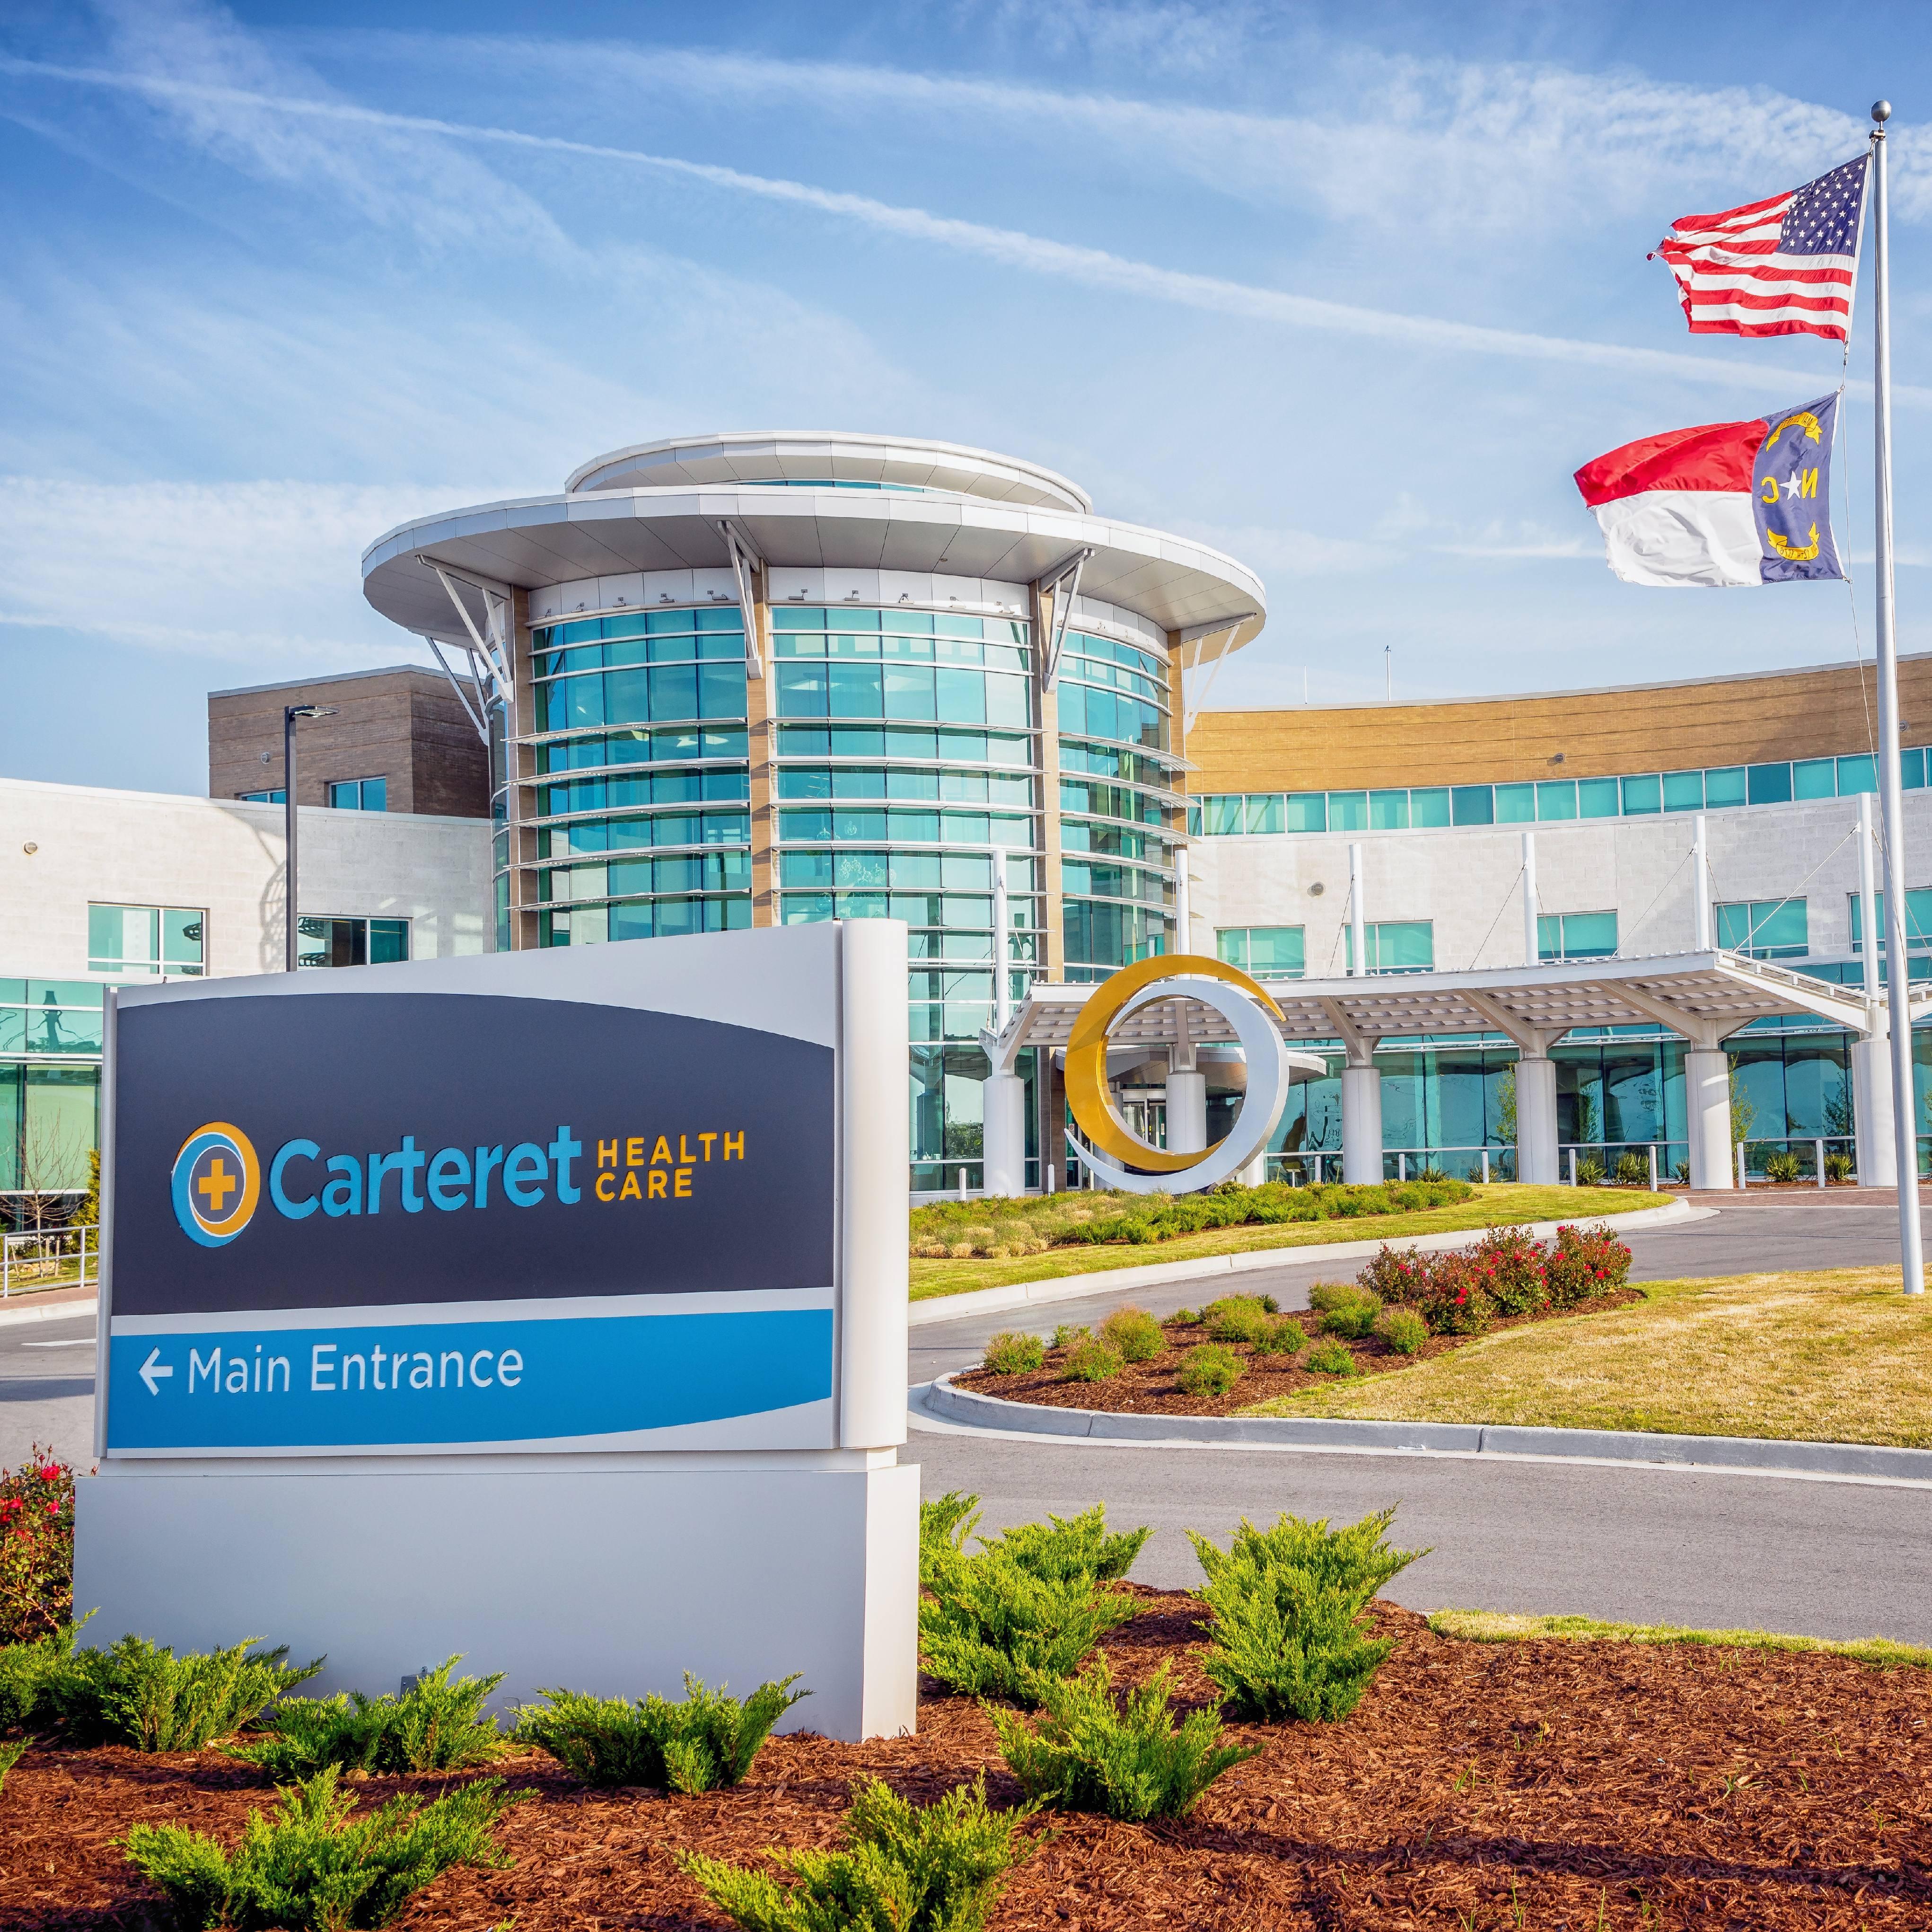 Cataret Health Care building